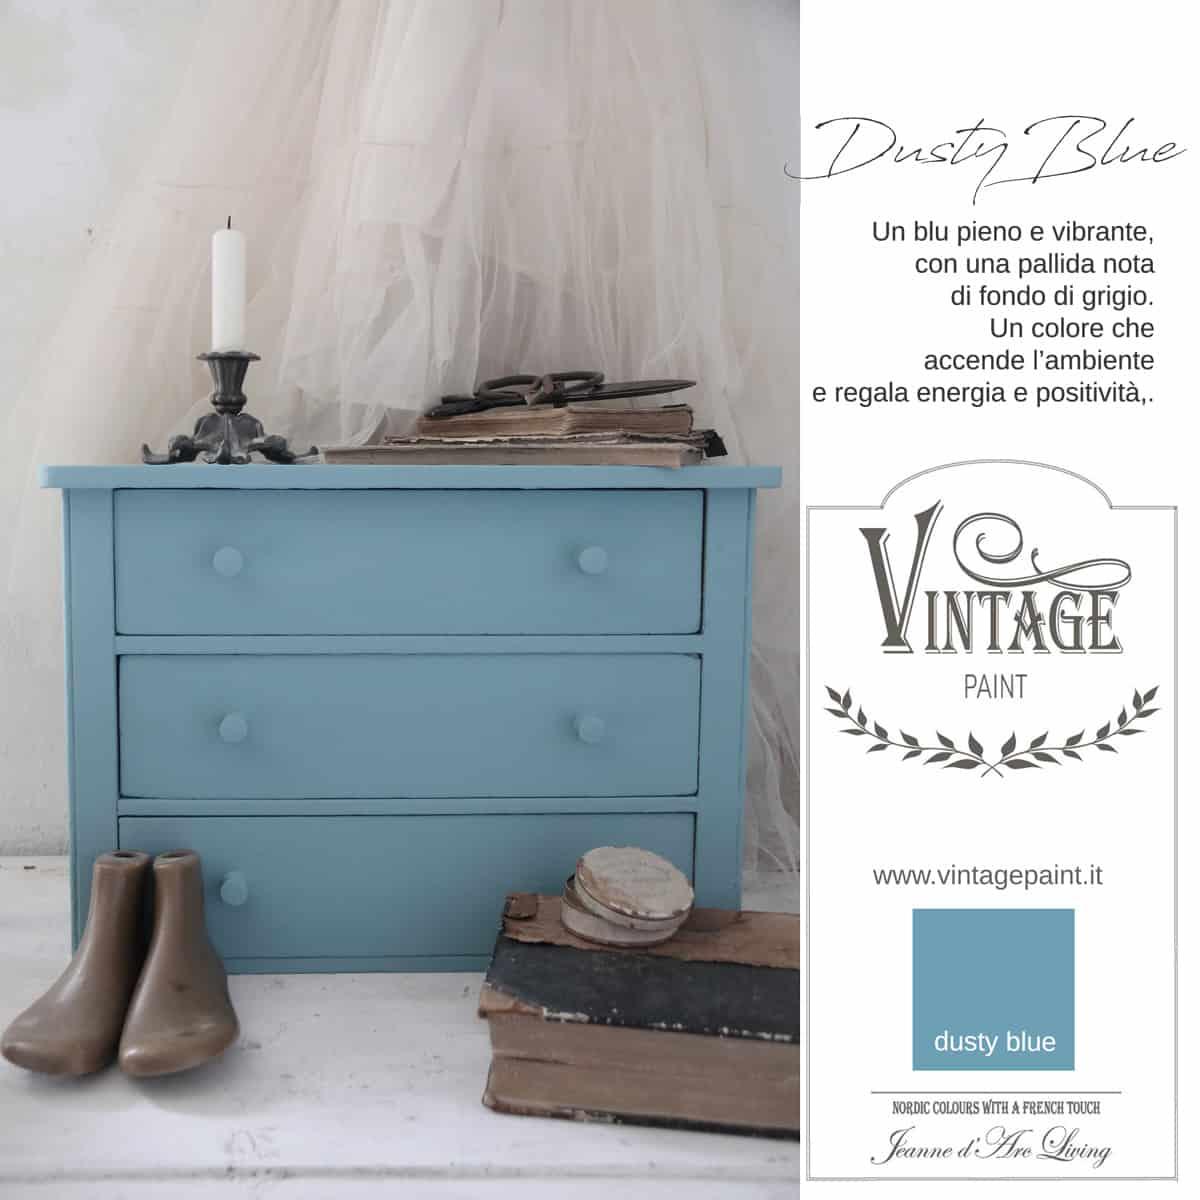 dusty blue blu azzurro vintage chalk paint vernici shabby chic autentico look gesso